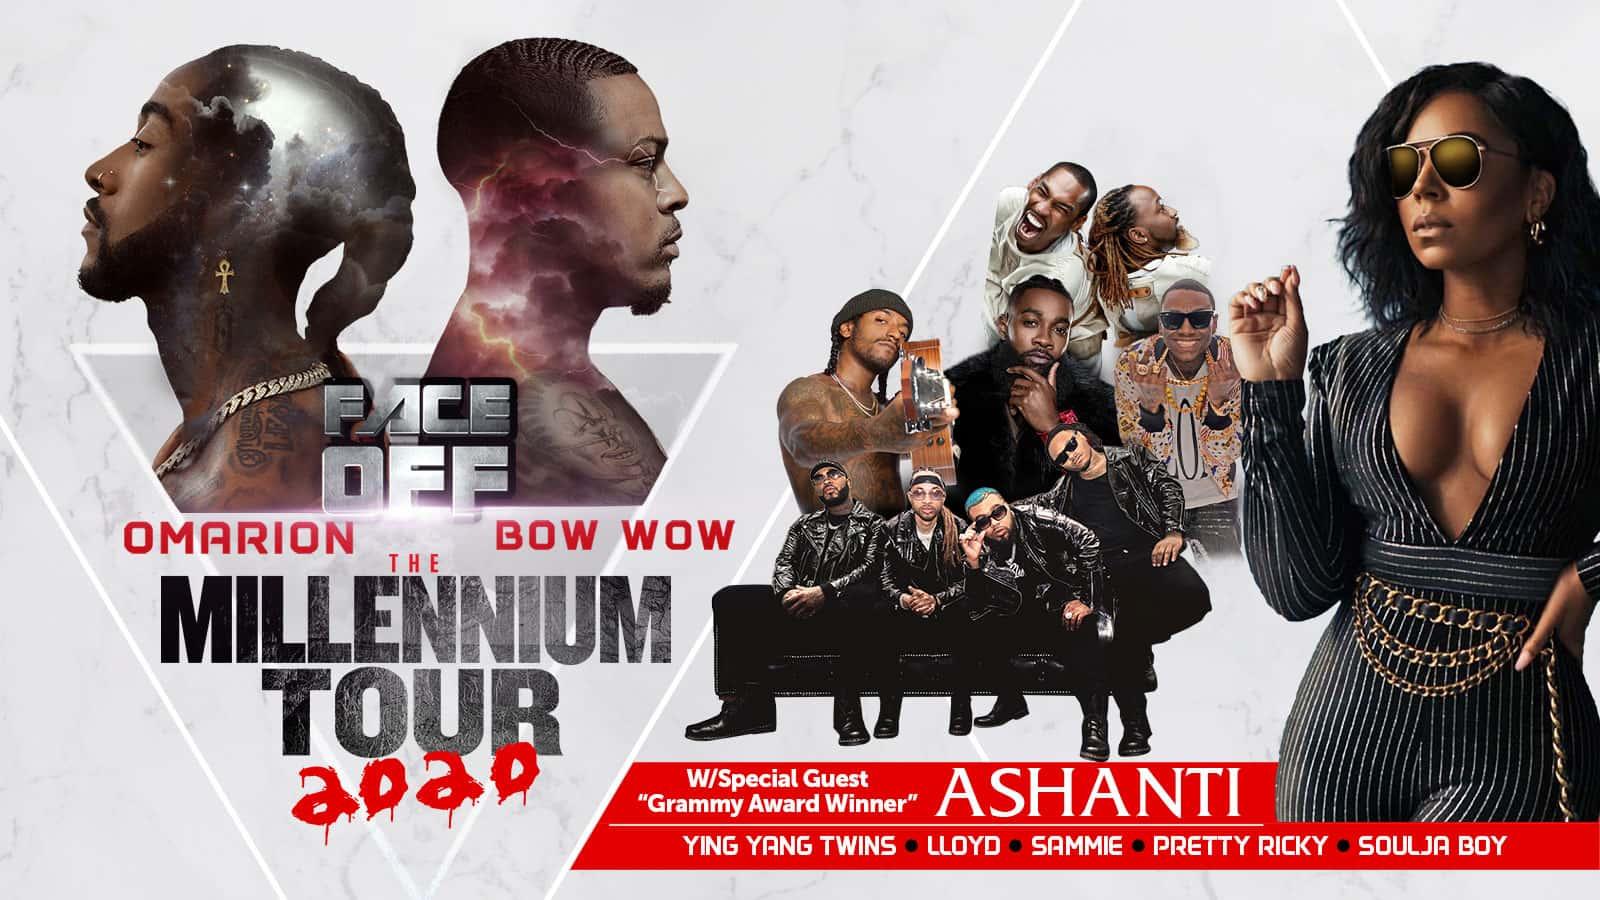 Millenium-Tour-Video-Formatted-1600-x-900-Ashanti-Added